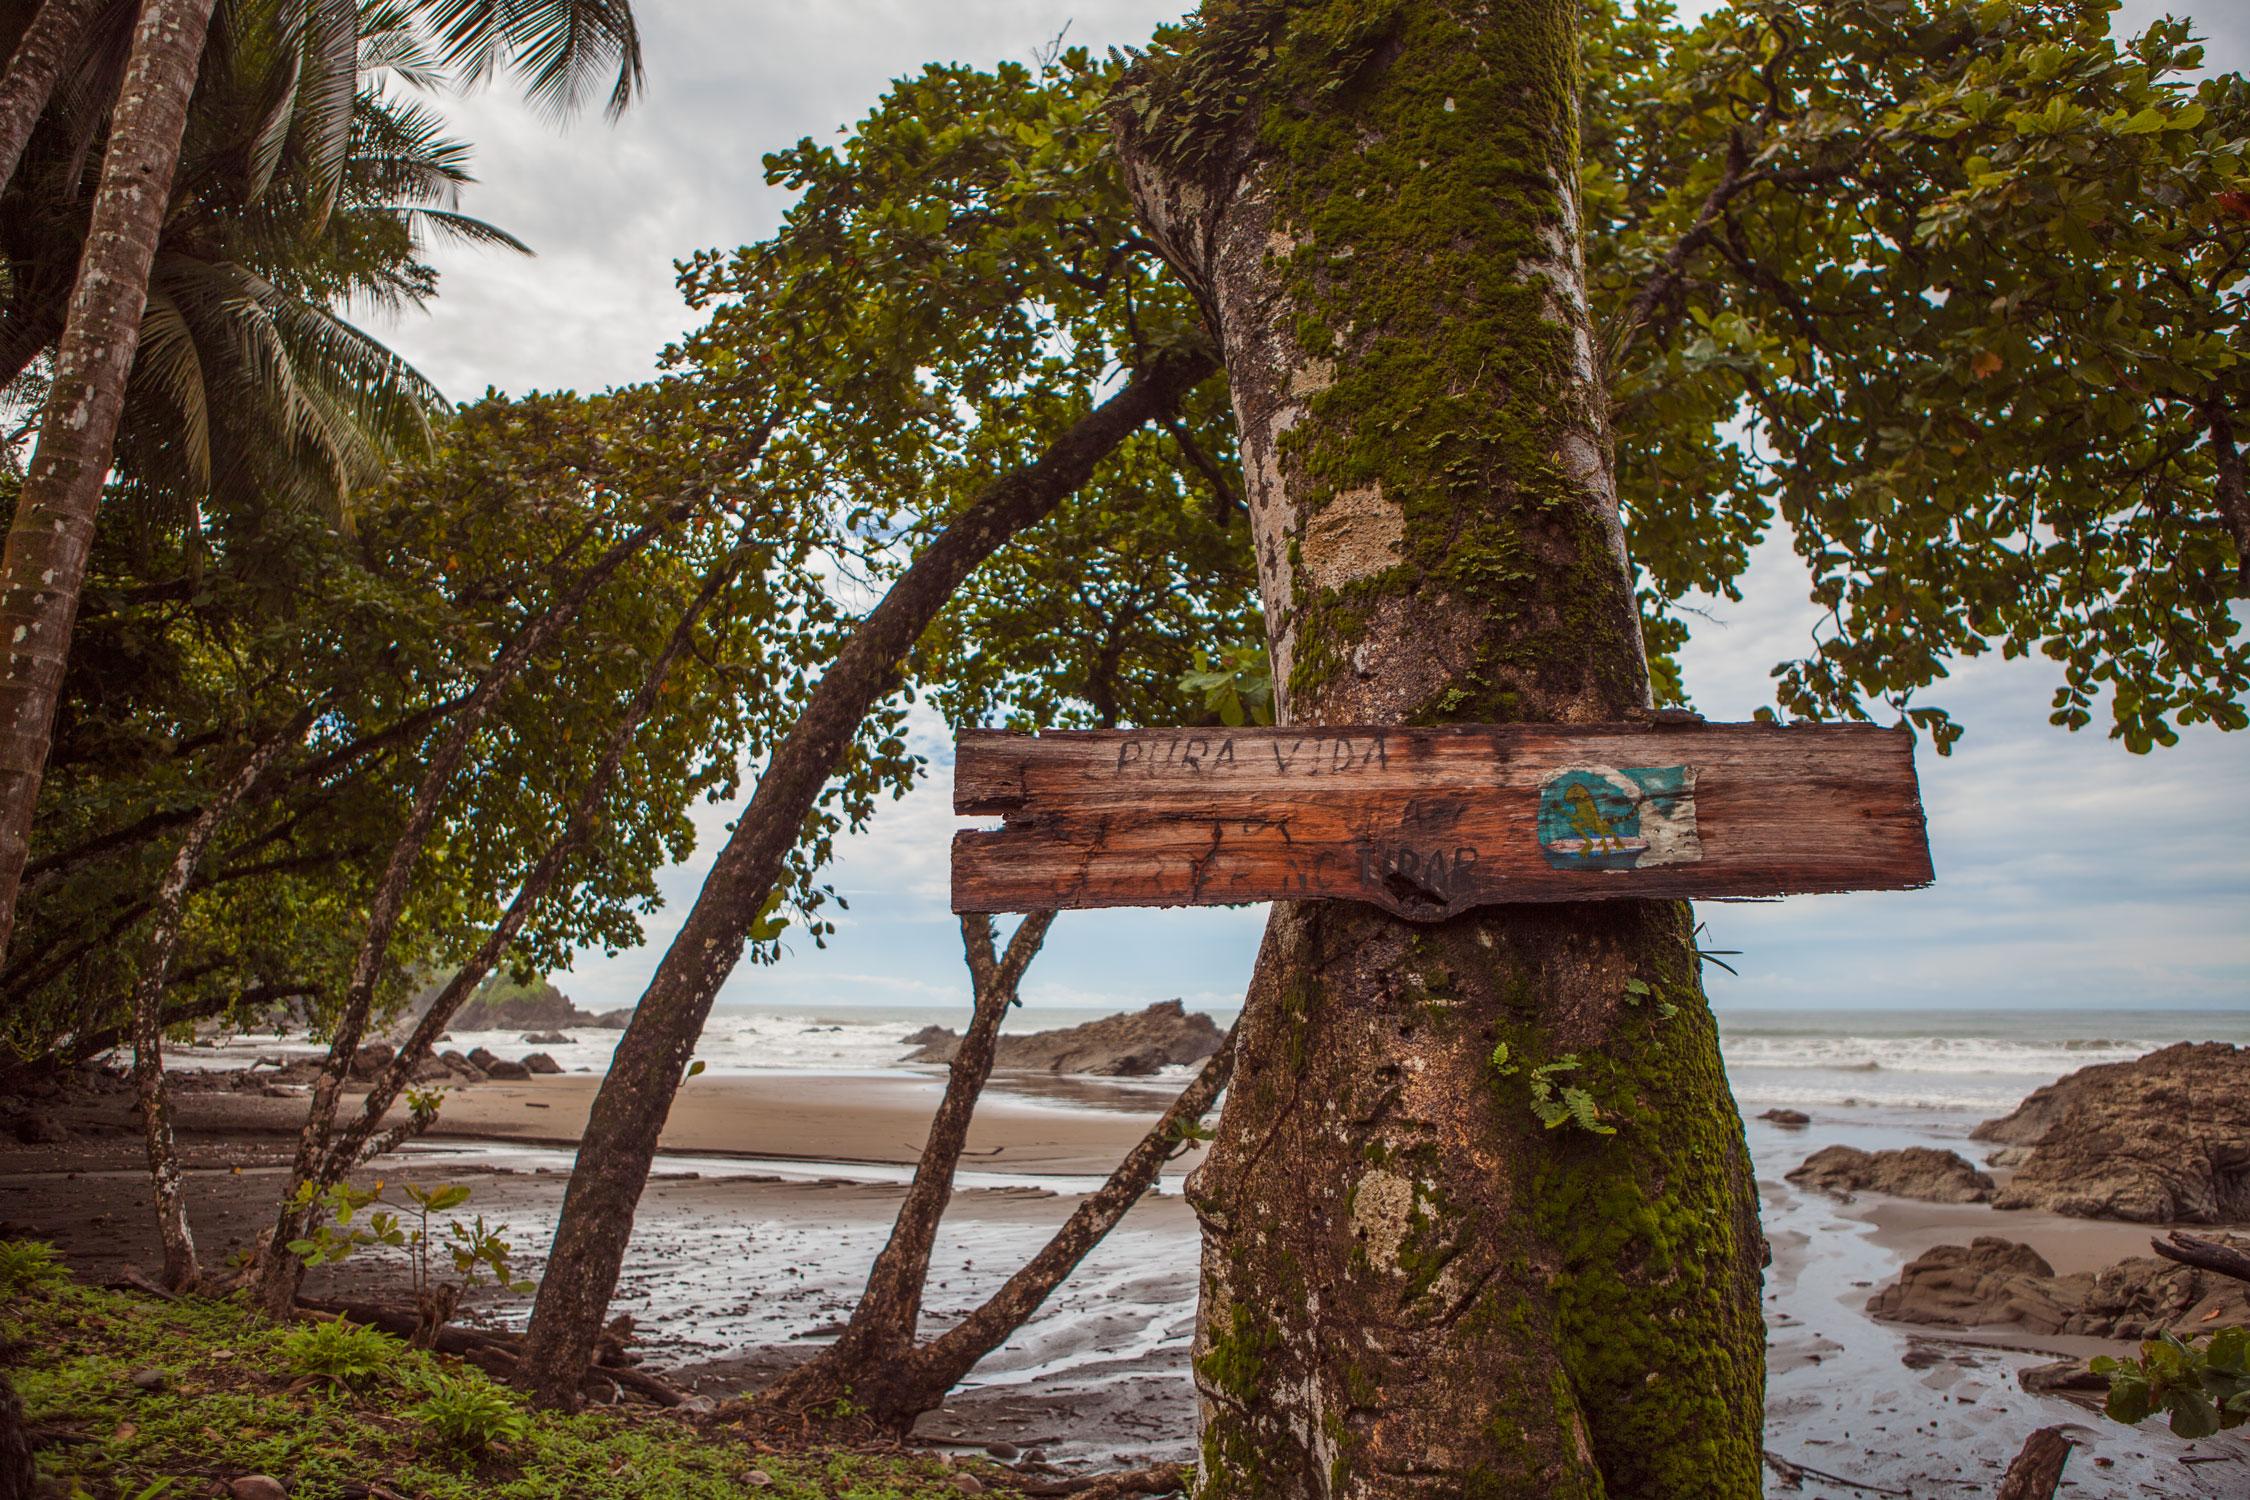 dominical-costa-rica-wander-south-beach-sign.jpg